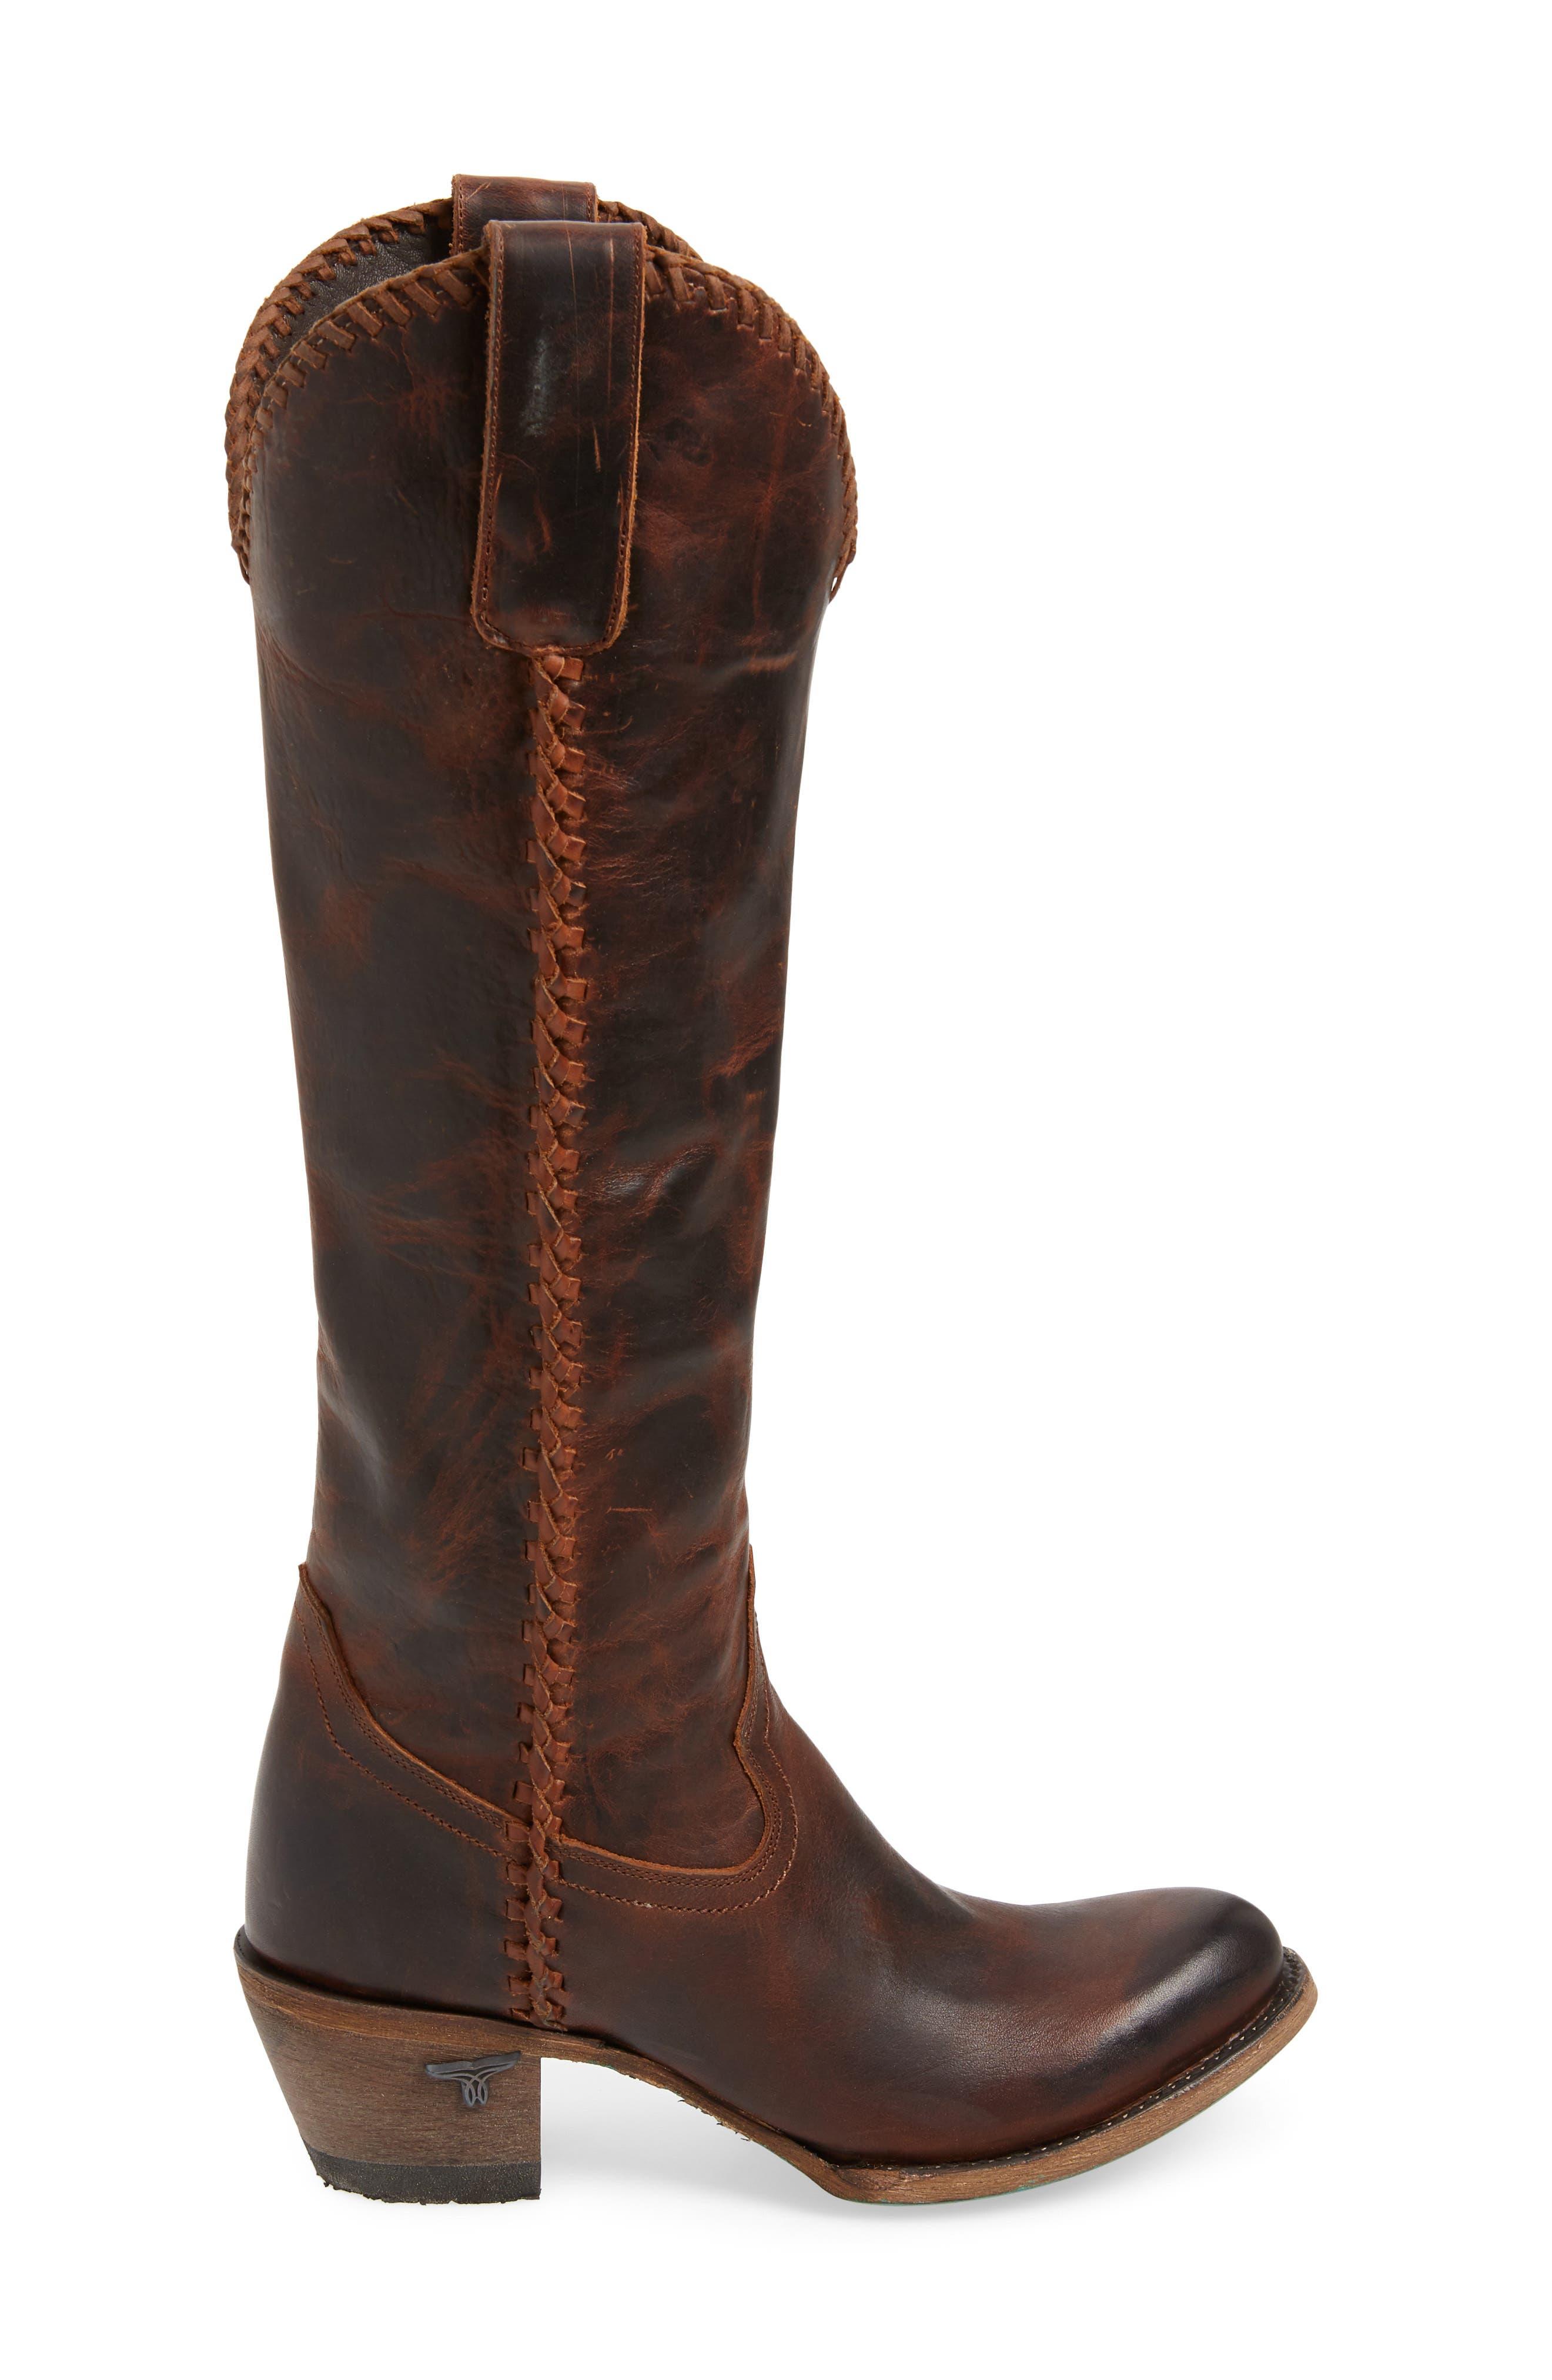 LANE BOOTS,                             Plain Jane Knee High Western Boot,                             Alternate thumbnail 3, color,                             COGNAC LEATHER